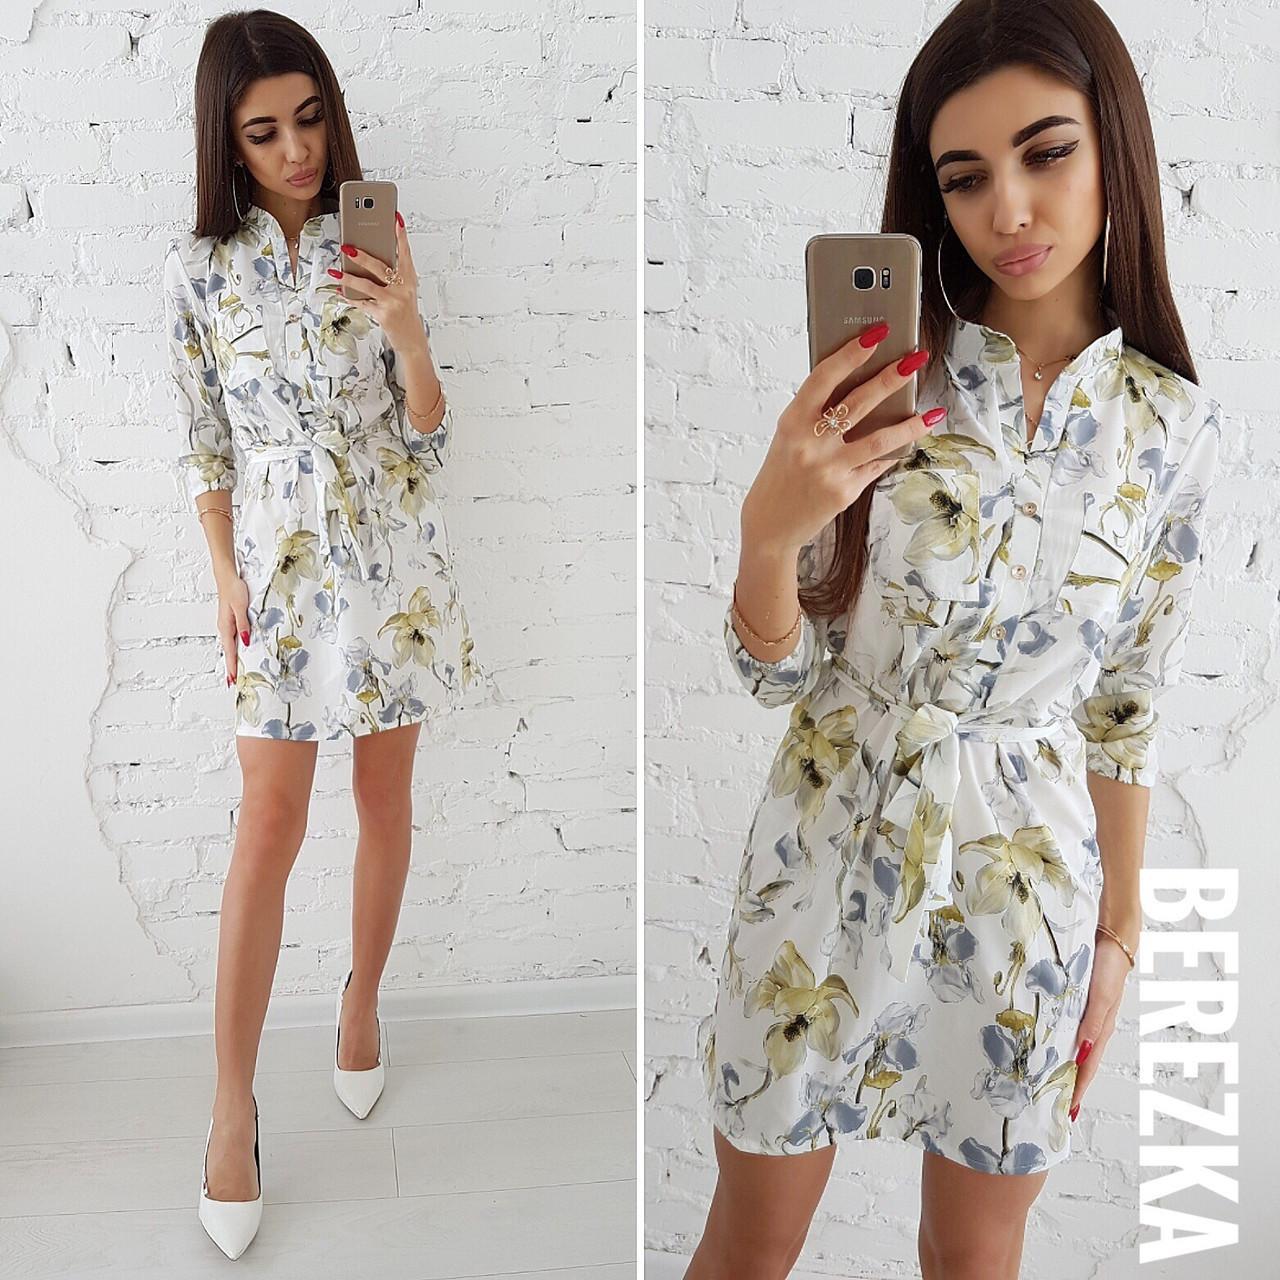 Платье-рубашка на лето с принтом 66ty1619